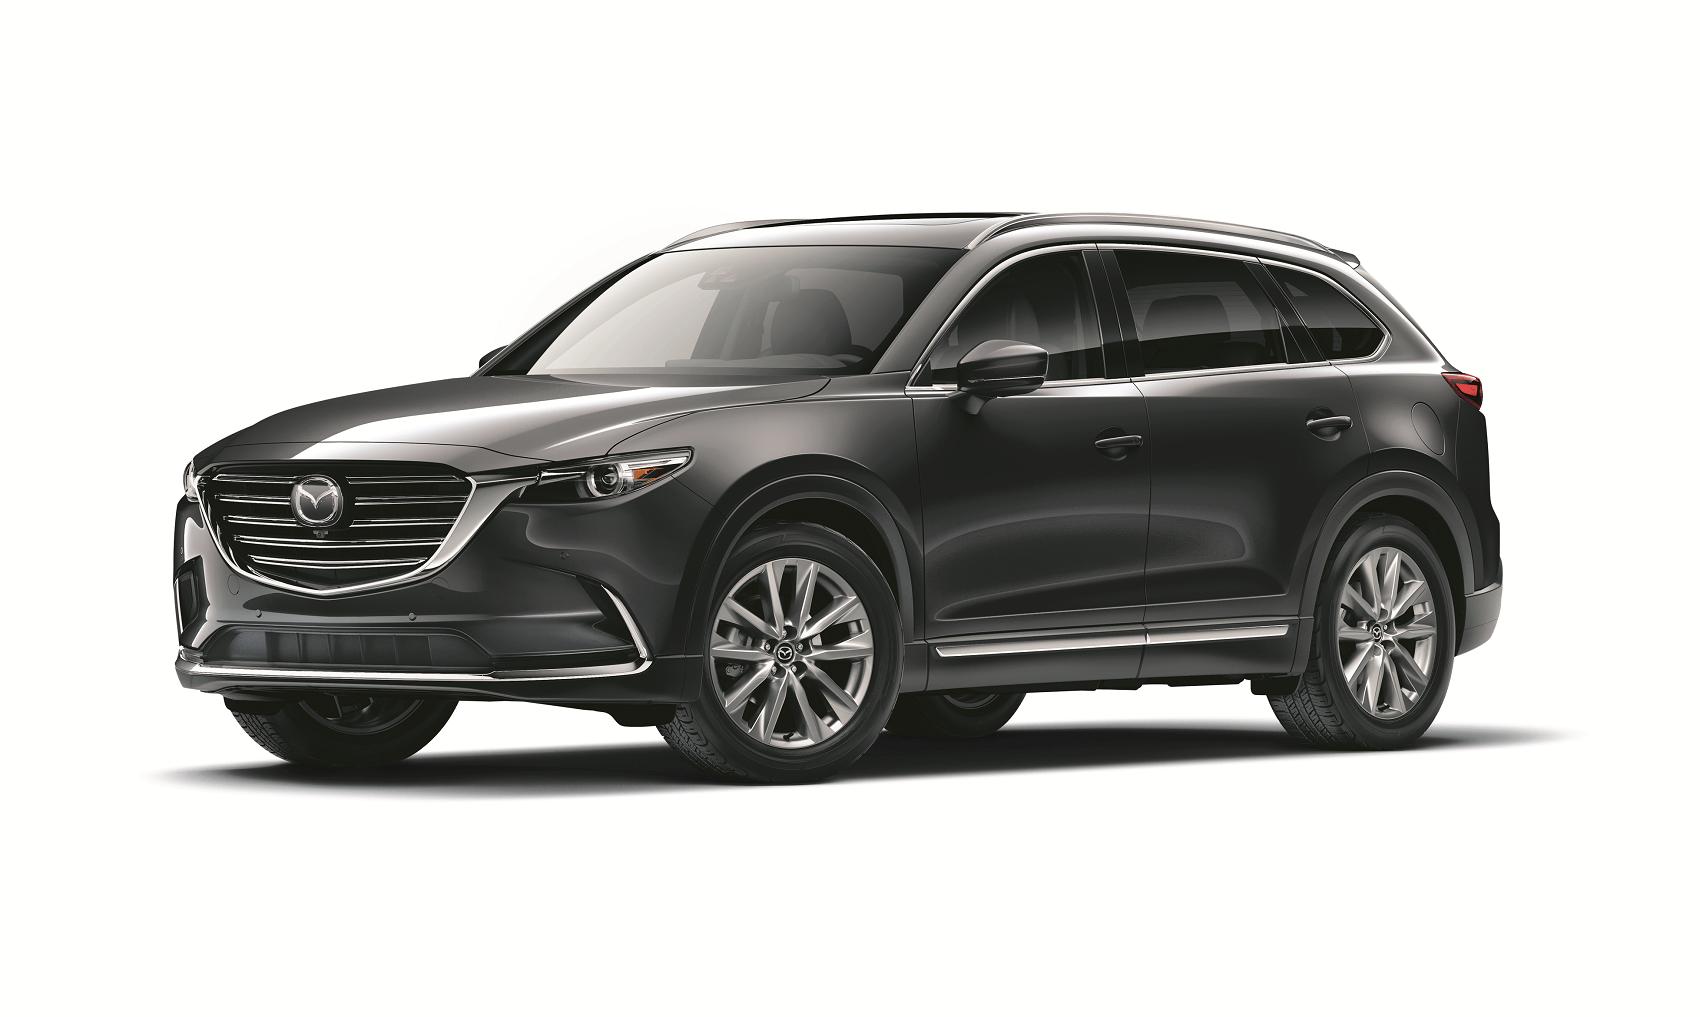 Mazda CX-9 Trim Level